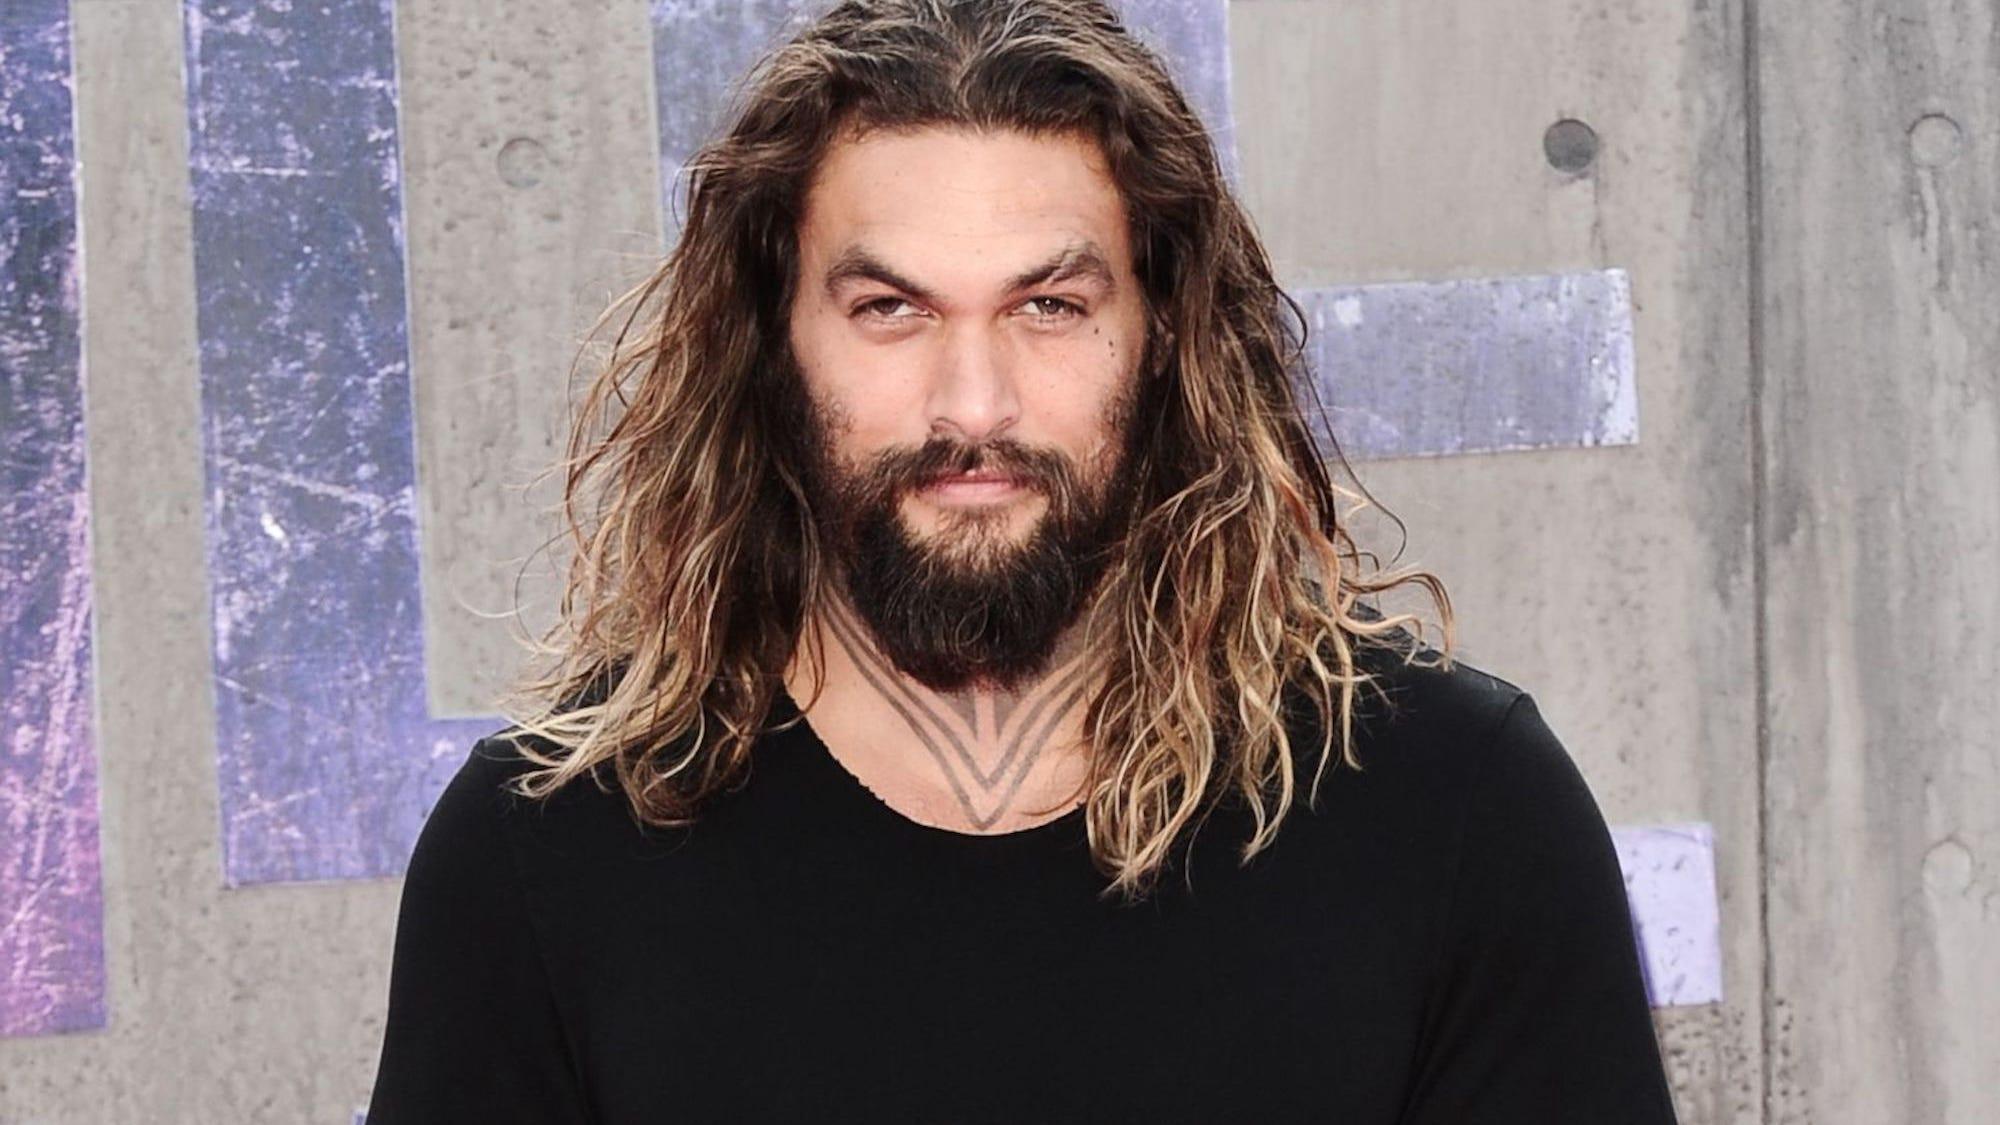 Why Jason Momoas Tattoo Makes Him The Perfect Aquaman